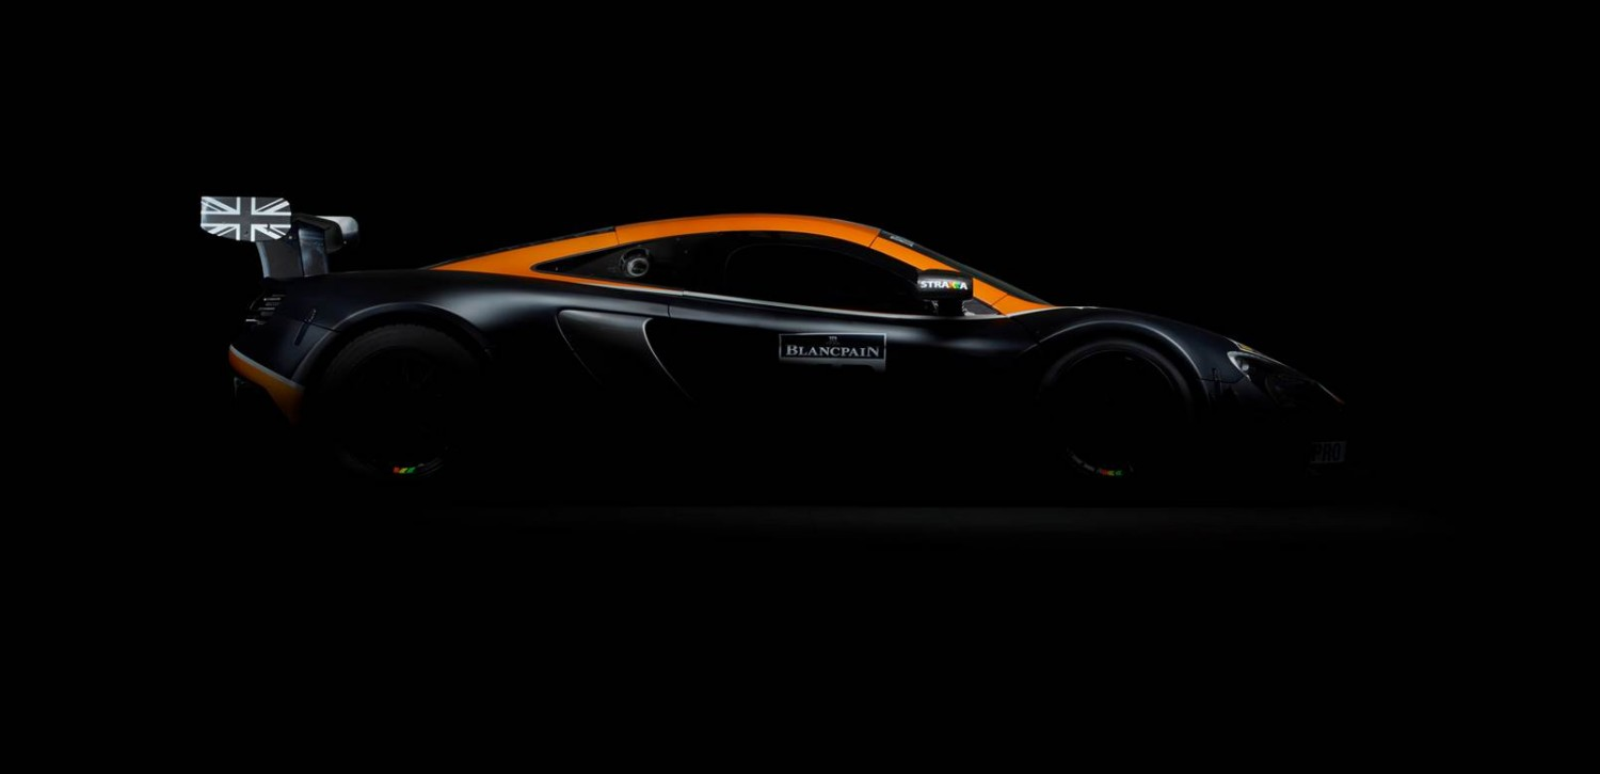 Strakka Racing to field McLaren GT 650S GT3 in four-car assault on Blancpain GT series